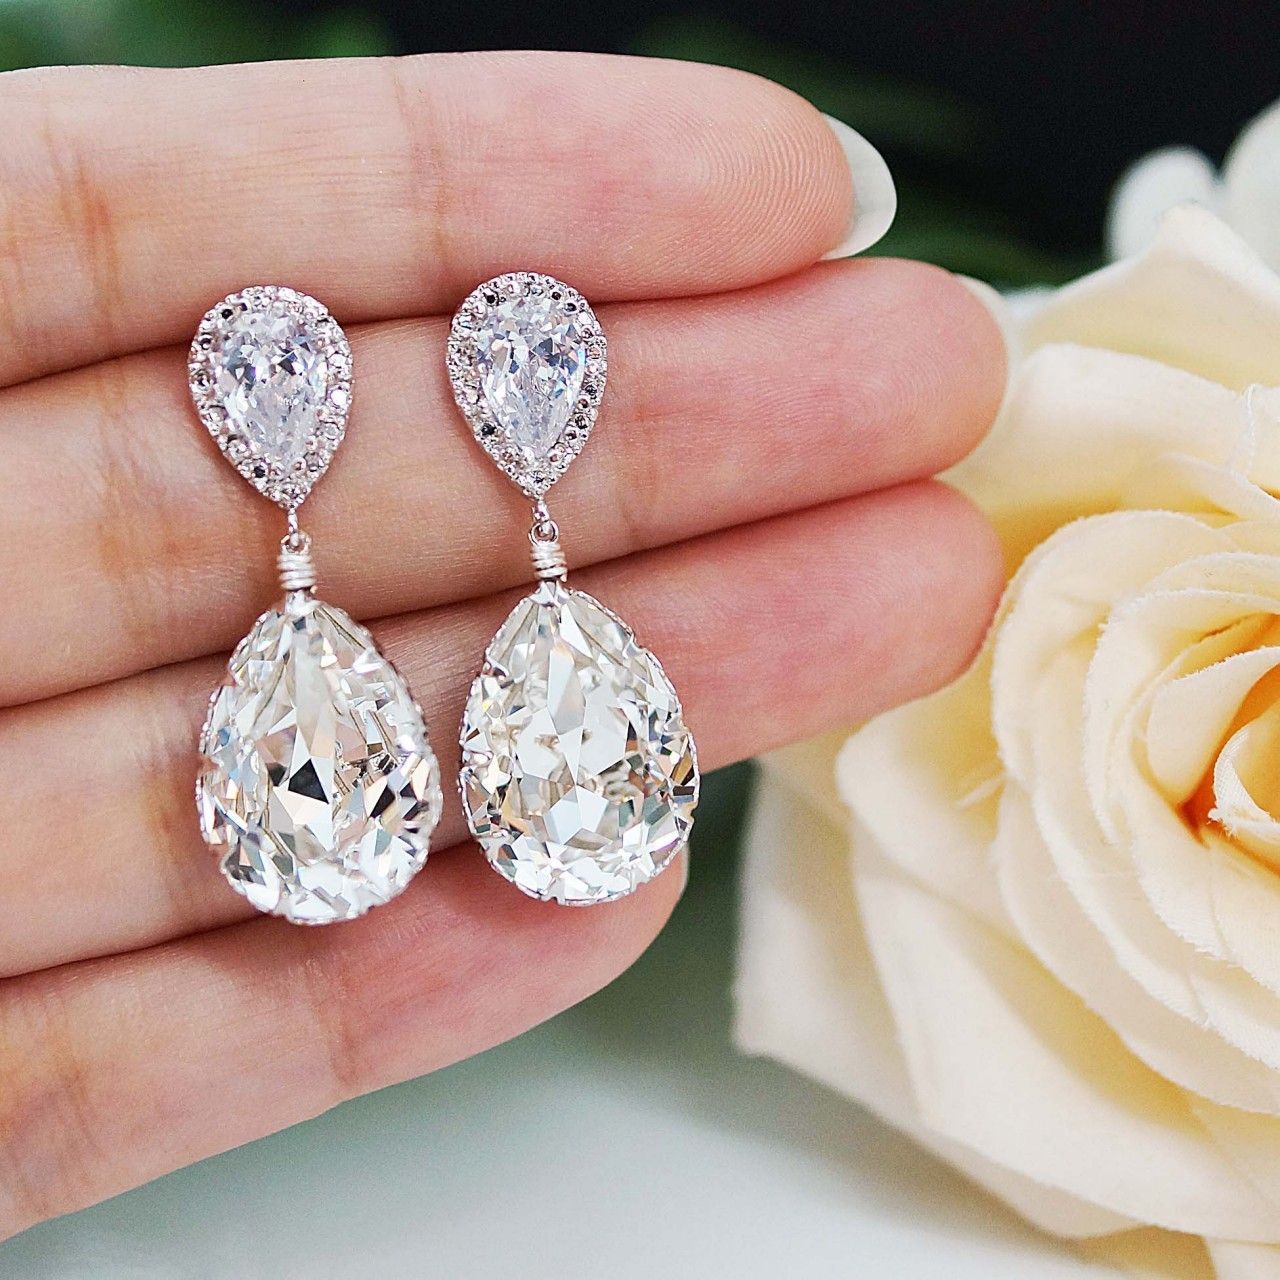 Clear White Swarovski Crystal Tear Drops Bridesmaid Earrings - Earrings Nation $29.99